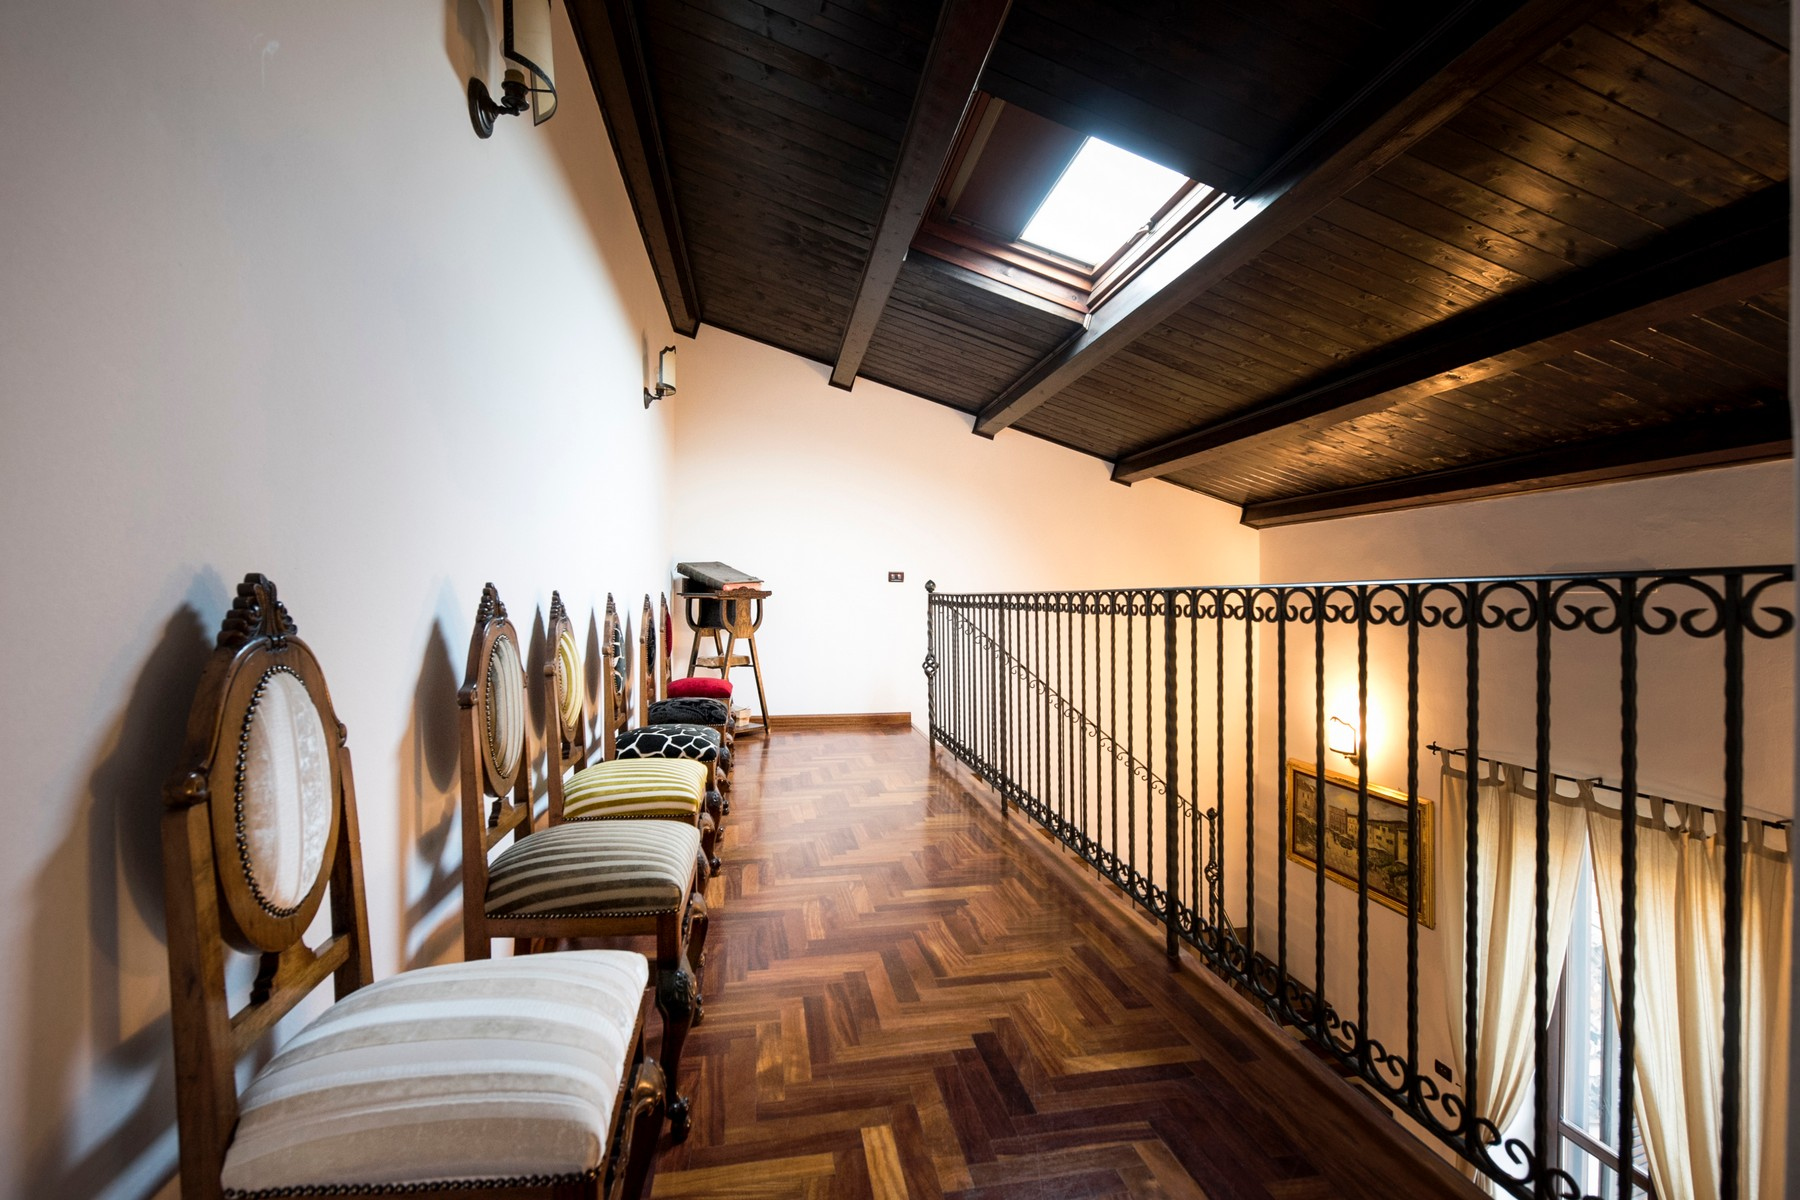 Casa indipendente in Vendita a Noto: 5 locali, 300 mq - Foto 25